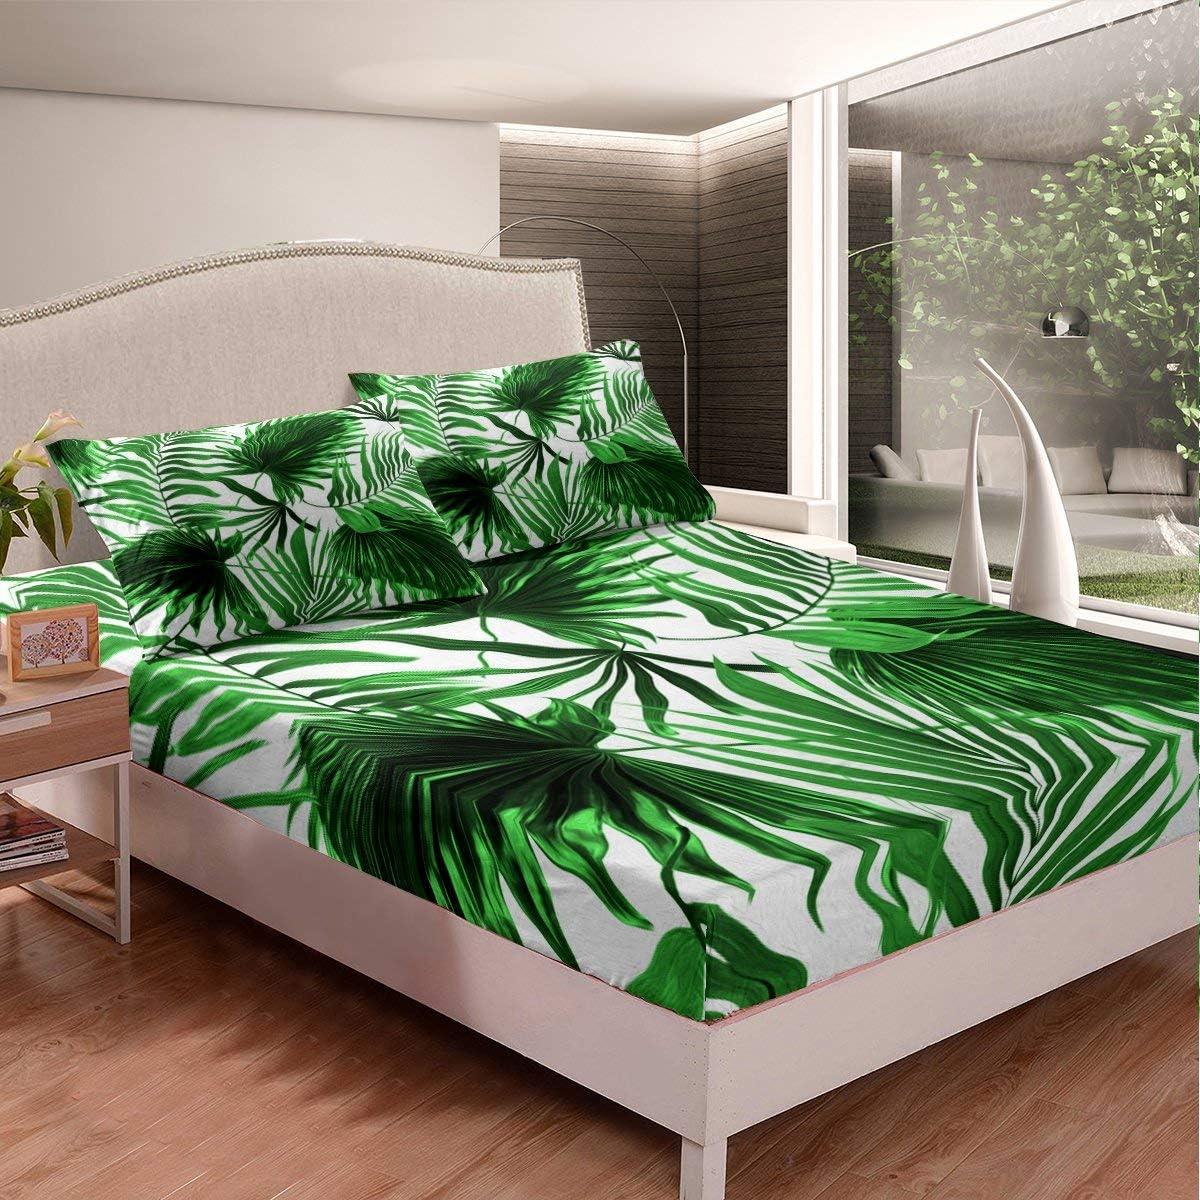 Erosebridal Palm Leaves Ranking TOP13 Ranking TOP14 Fitted Sheet Bed Set Tro Hawaiian